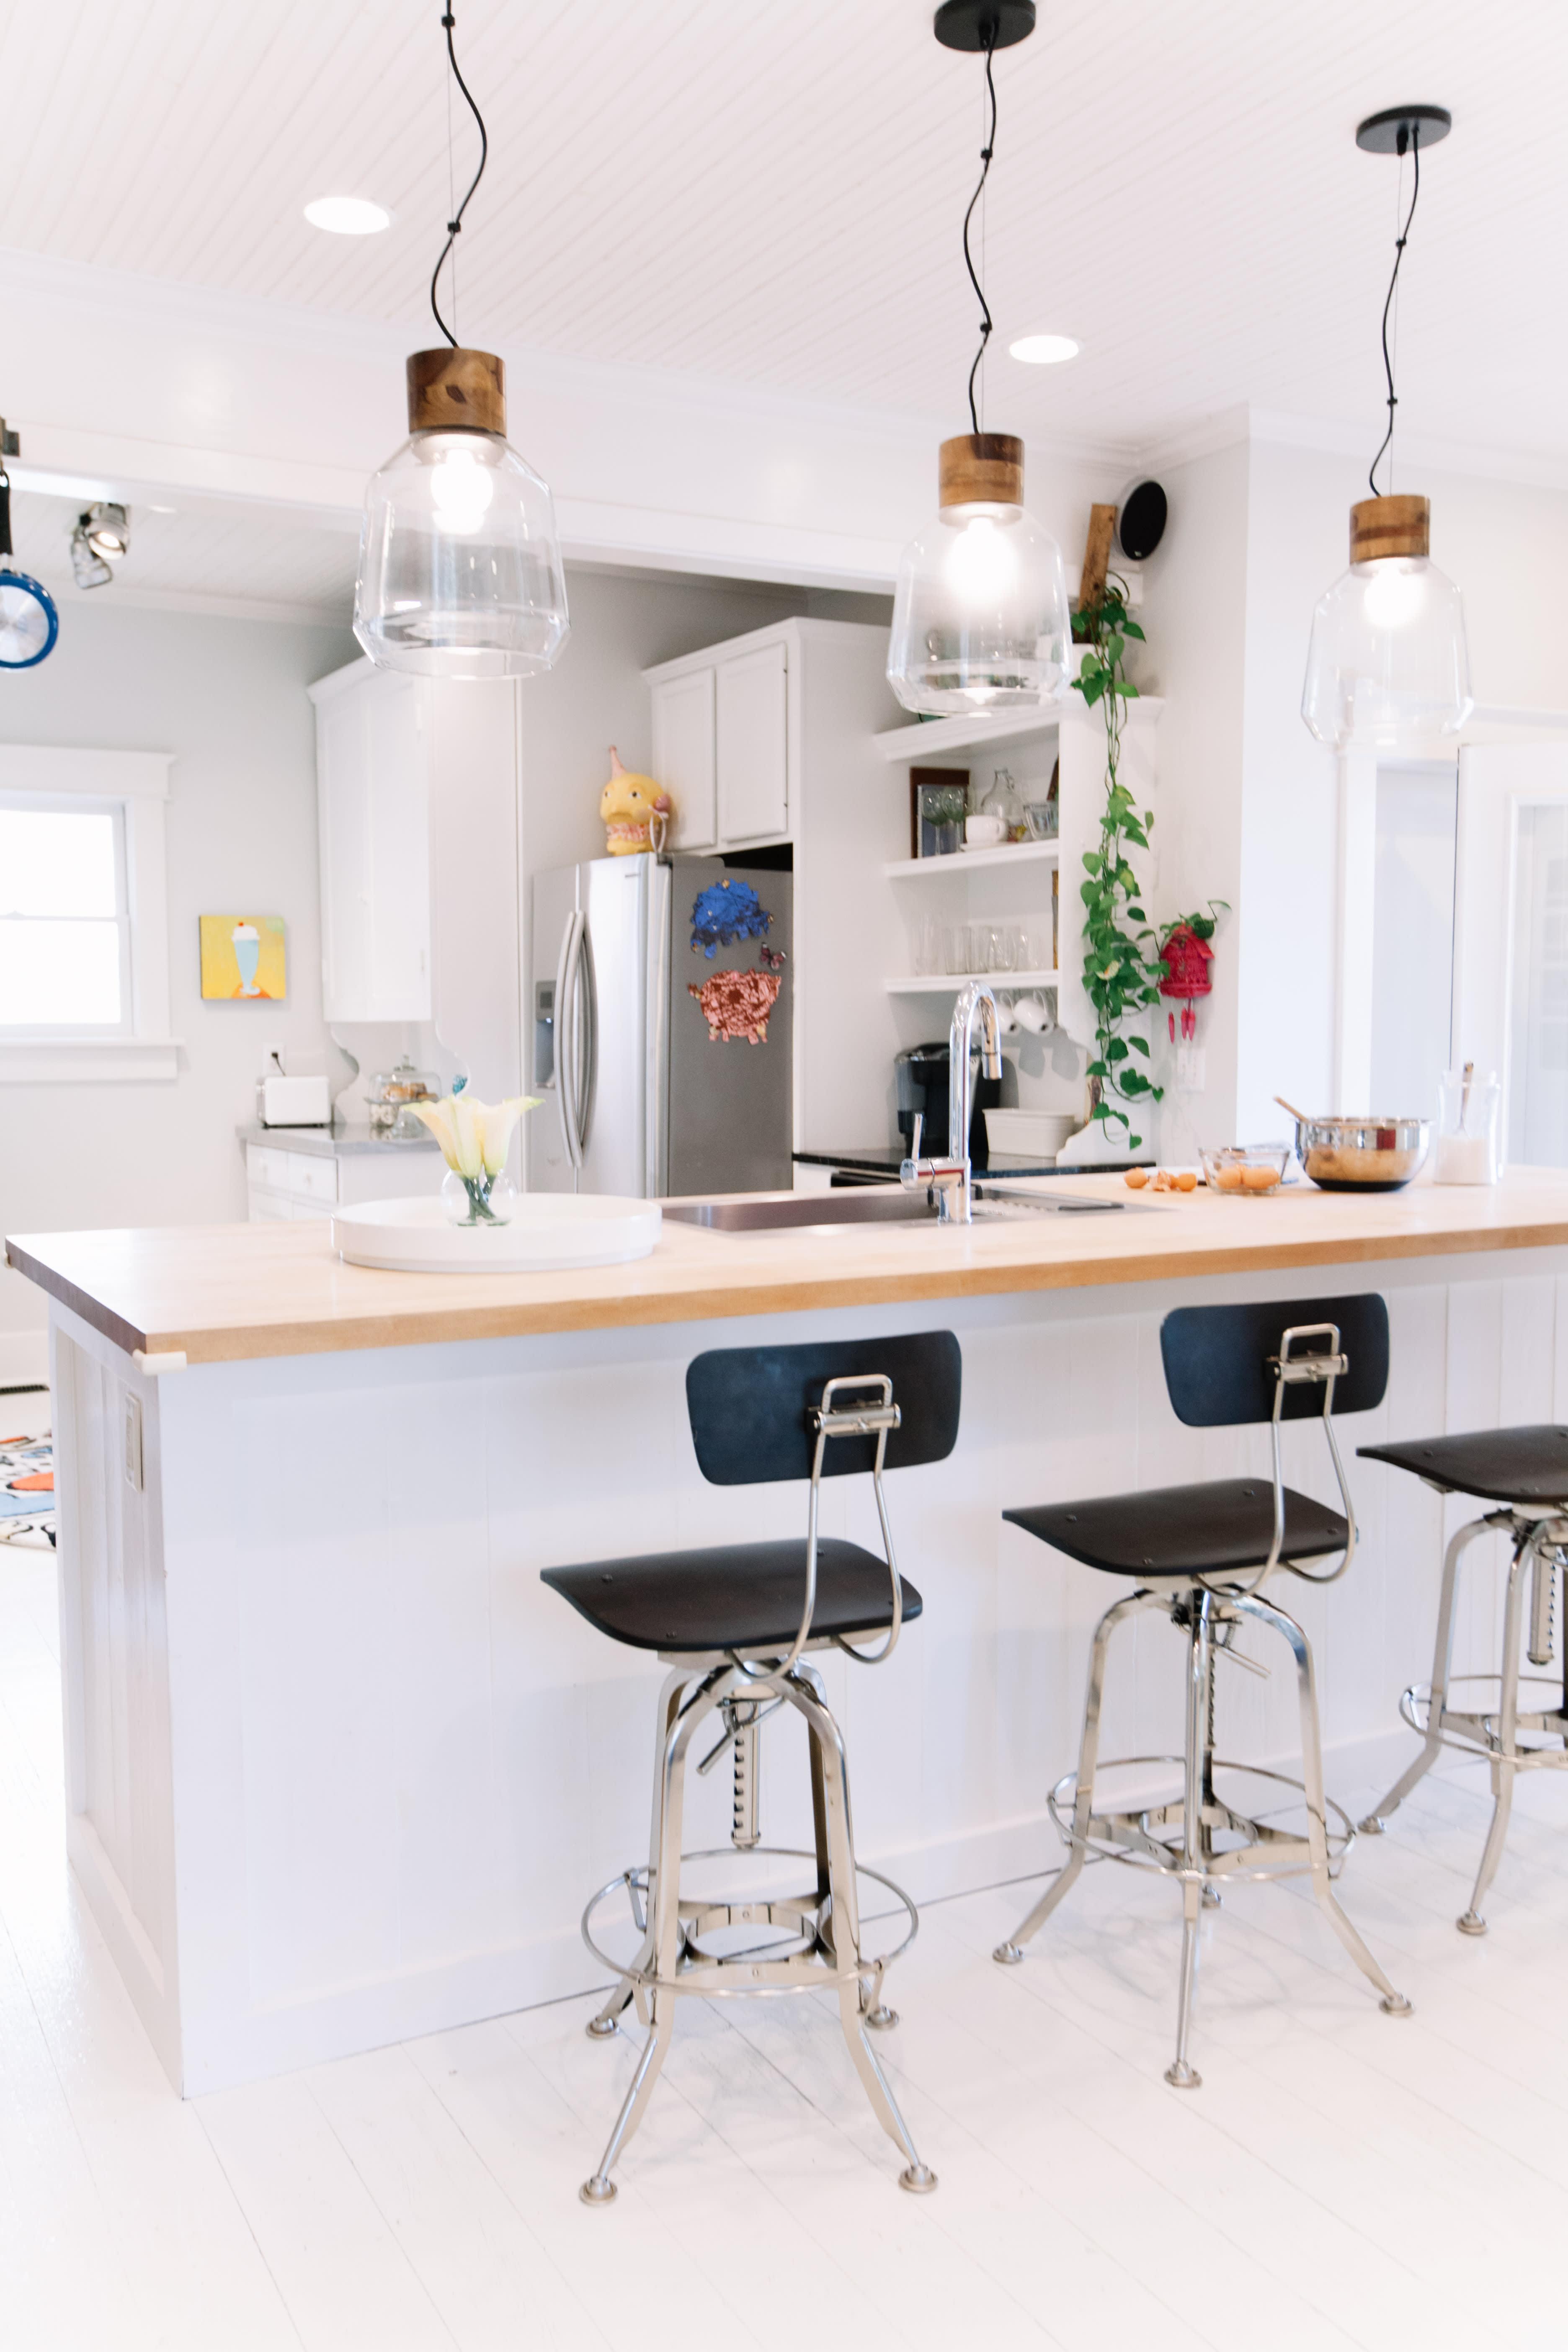 Gallery of Kitchen Island Breakfast Bar Ideas ...